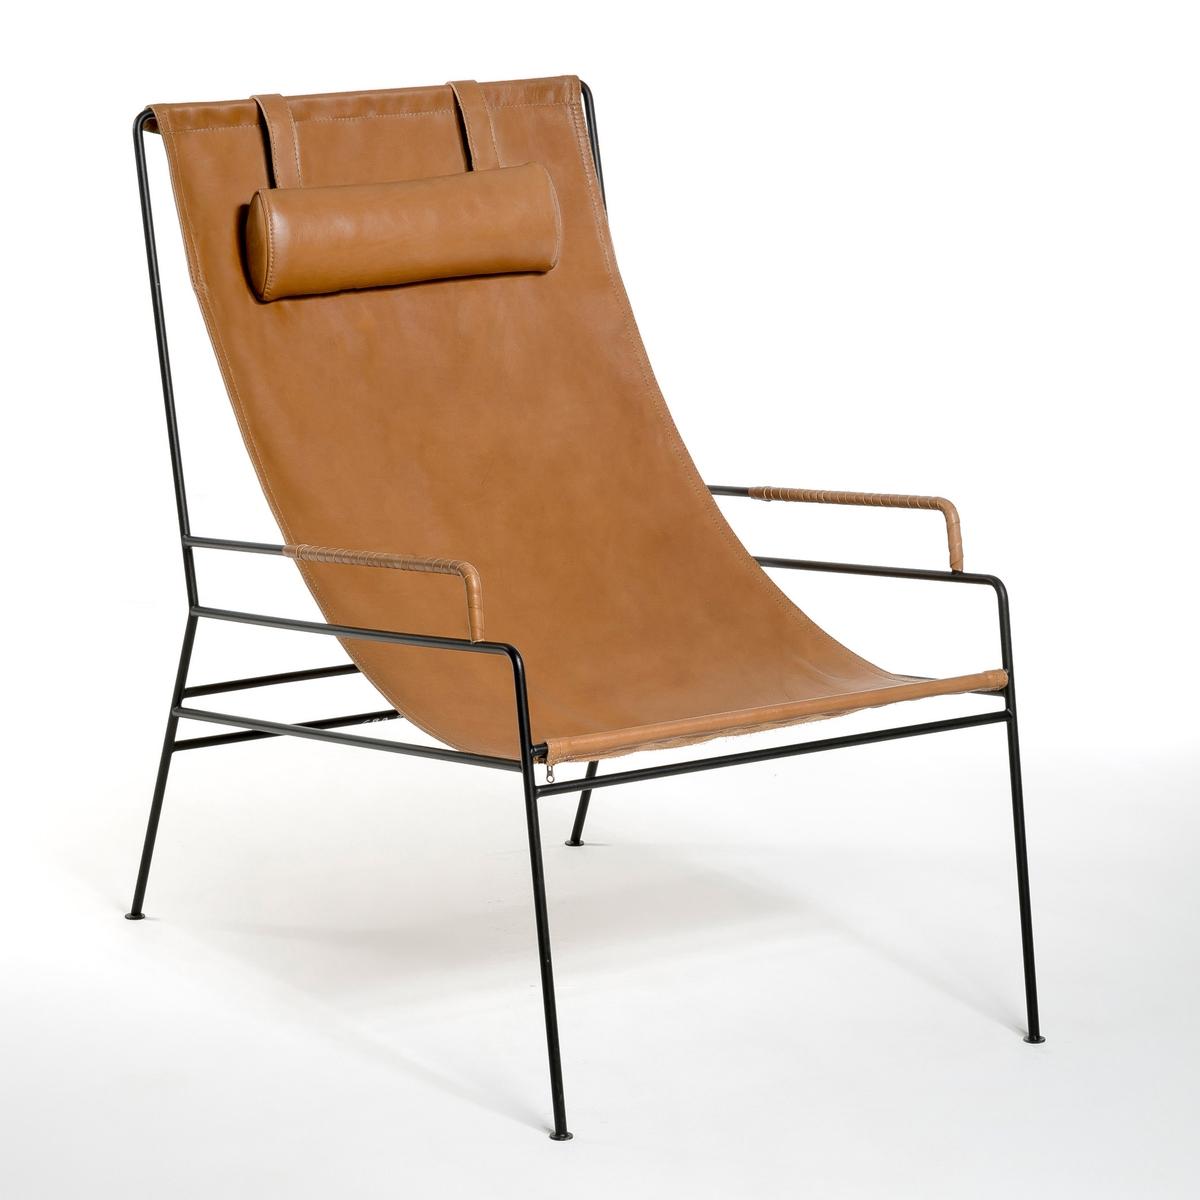 Кресло LaRedoute Celchar 1 местн. каштановый